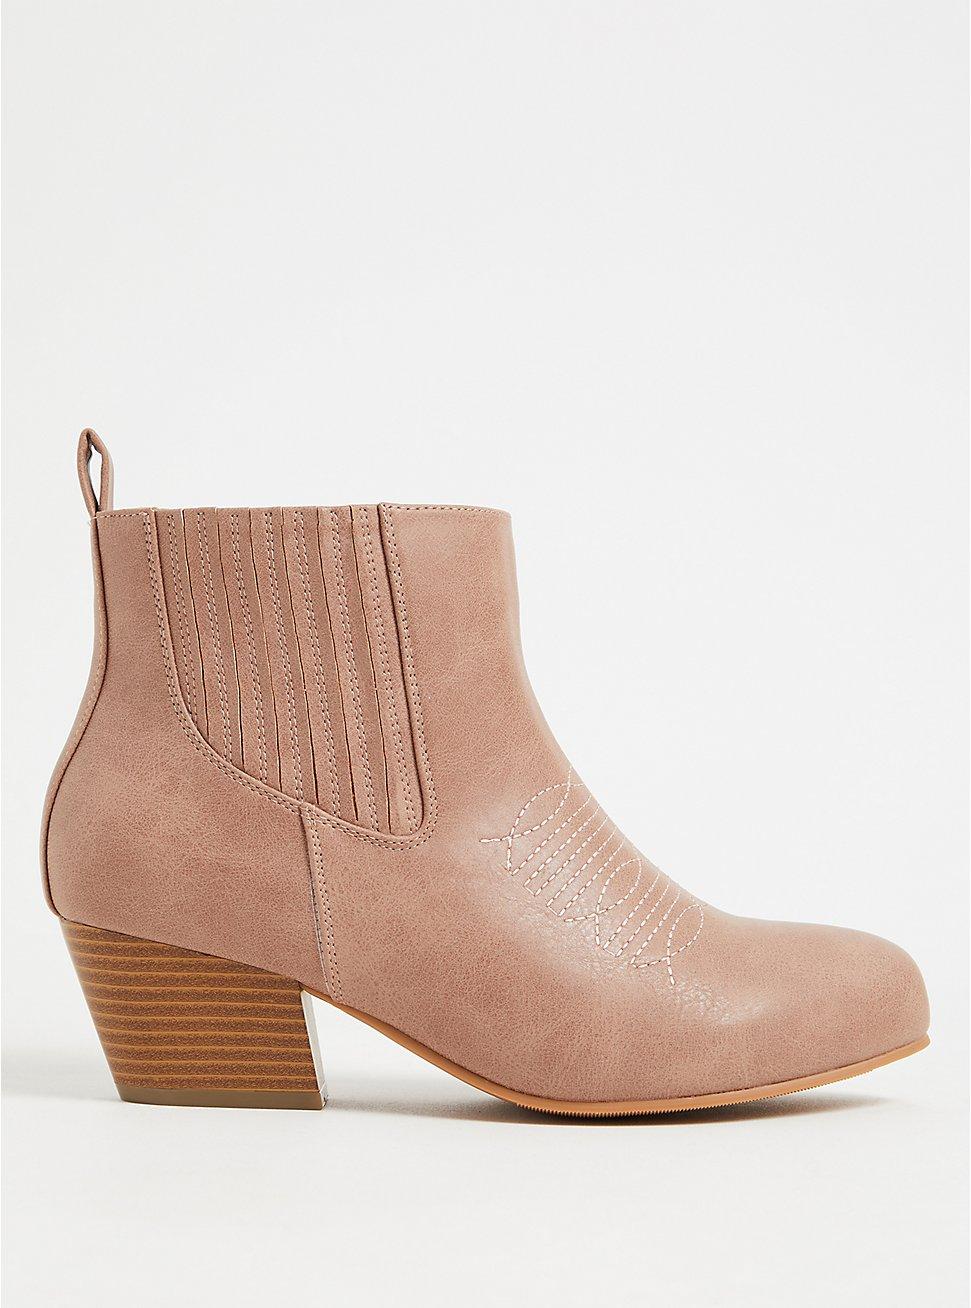 Blush Pink Faux Leather Cowboy Bootie (WW), BLUSH, hi-res